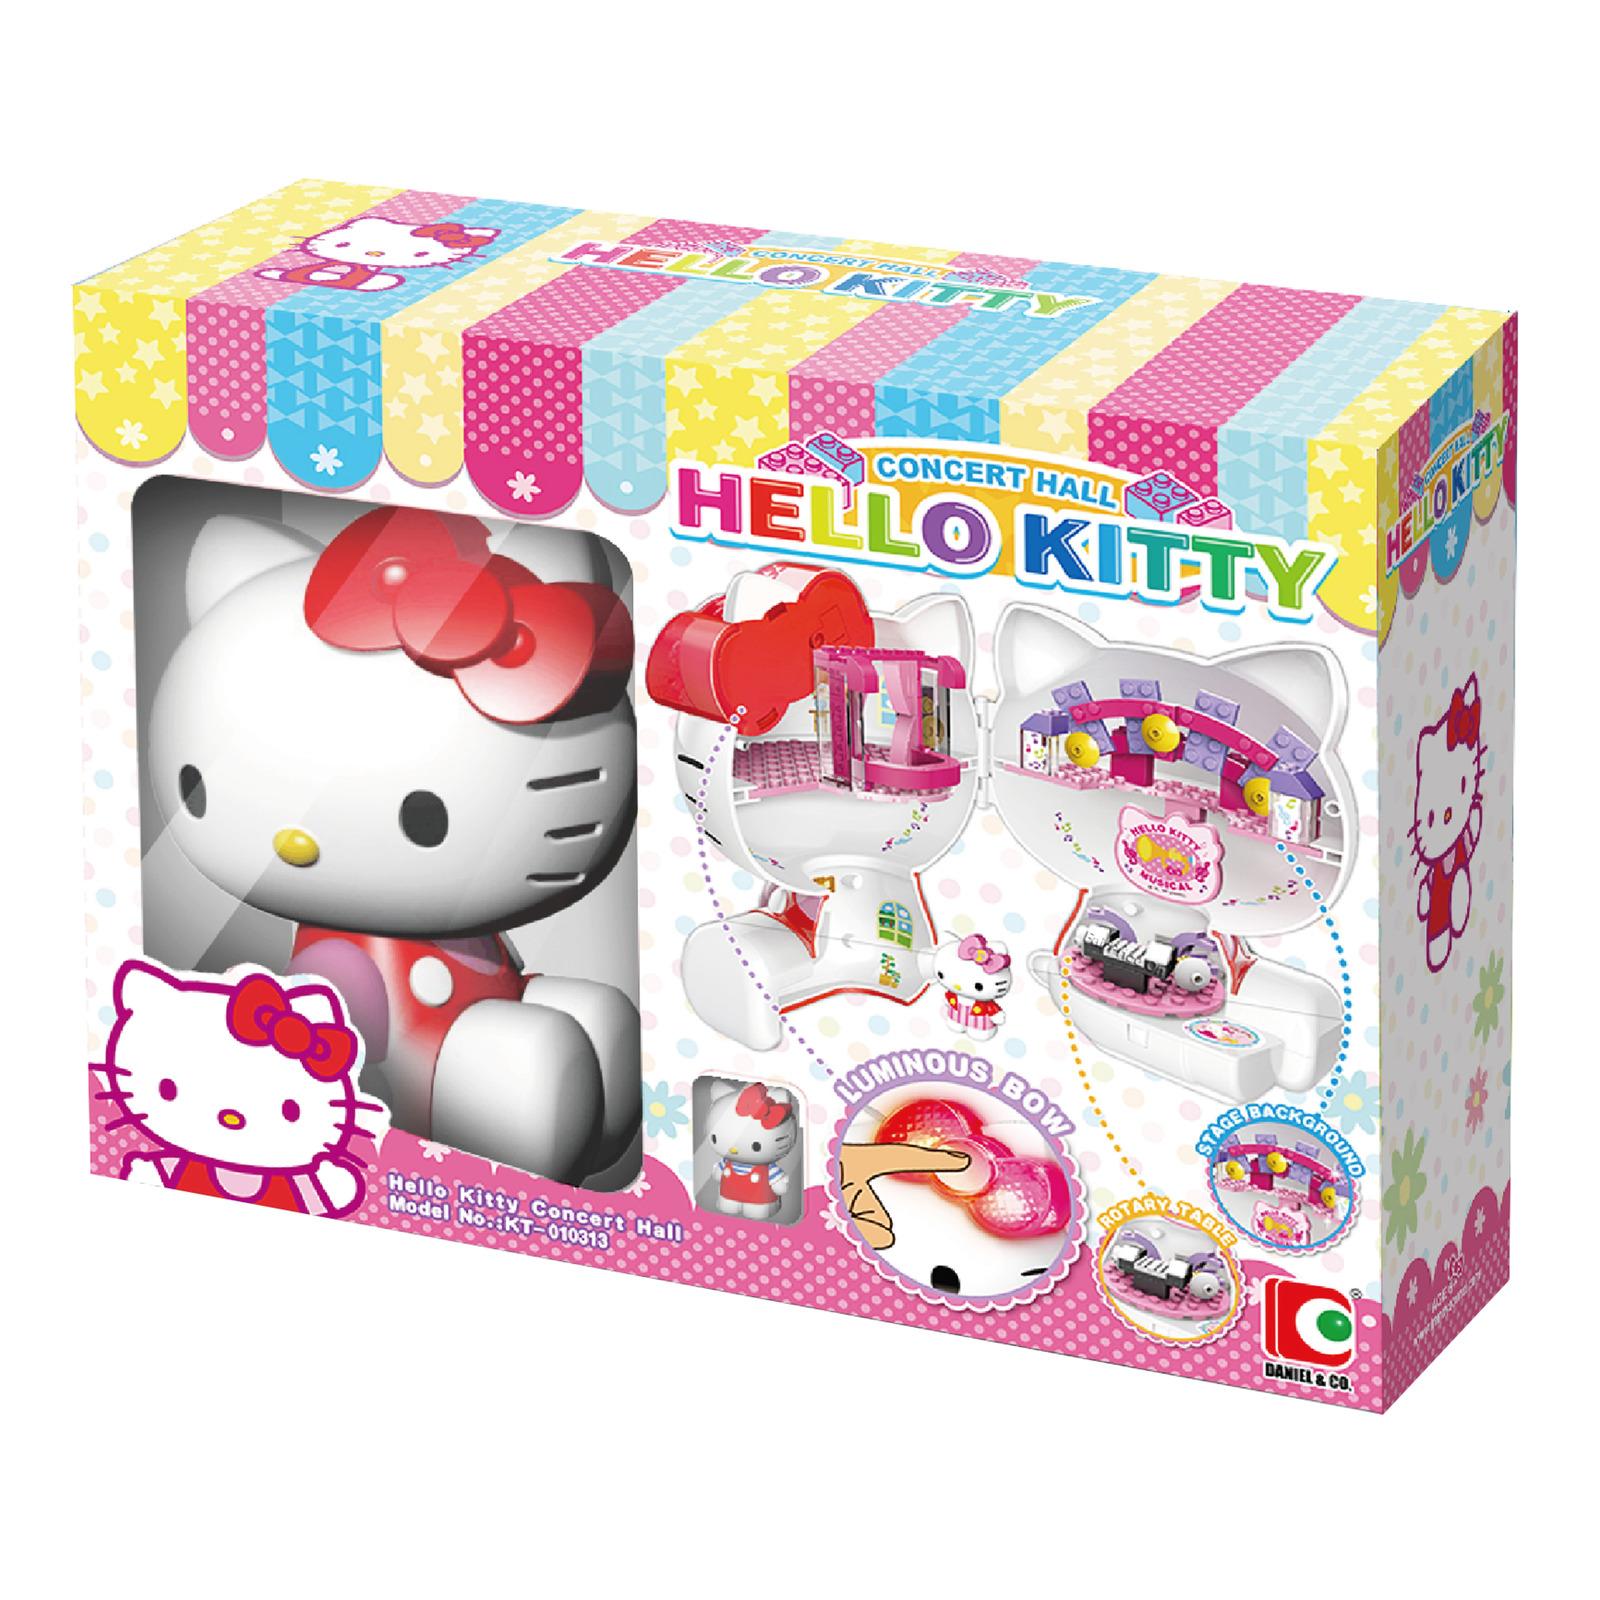 Daniel & Co. Hello Kitty Concert Hall